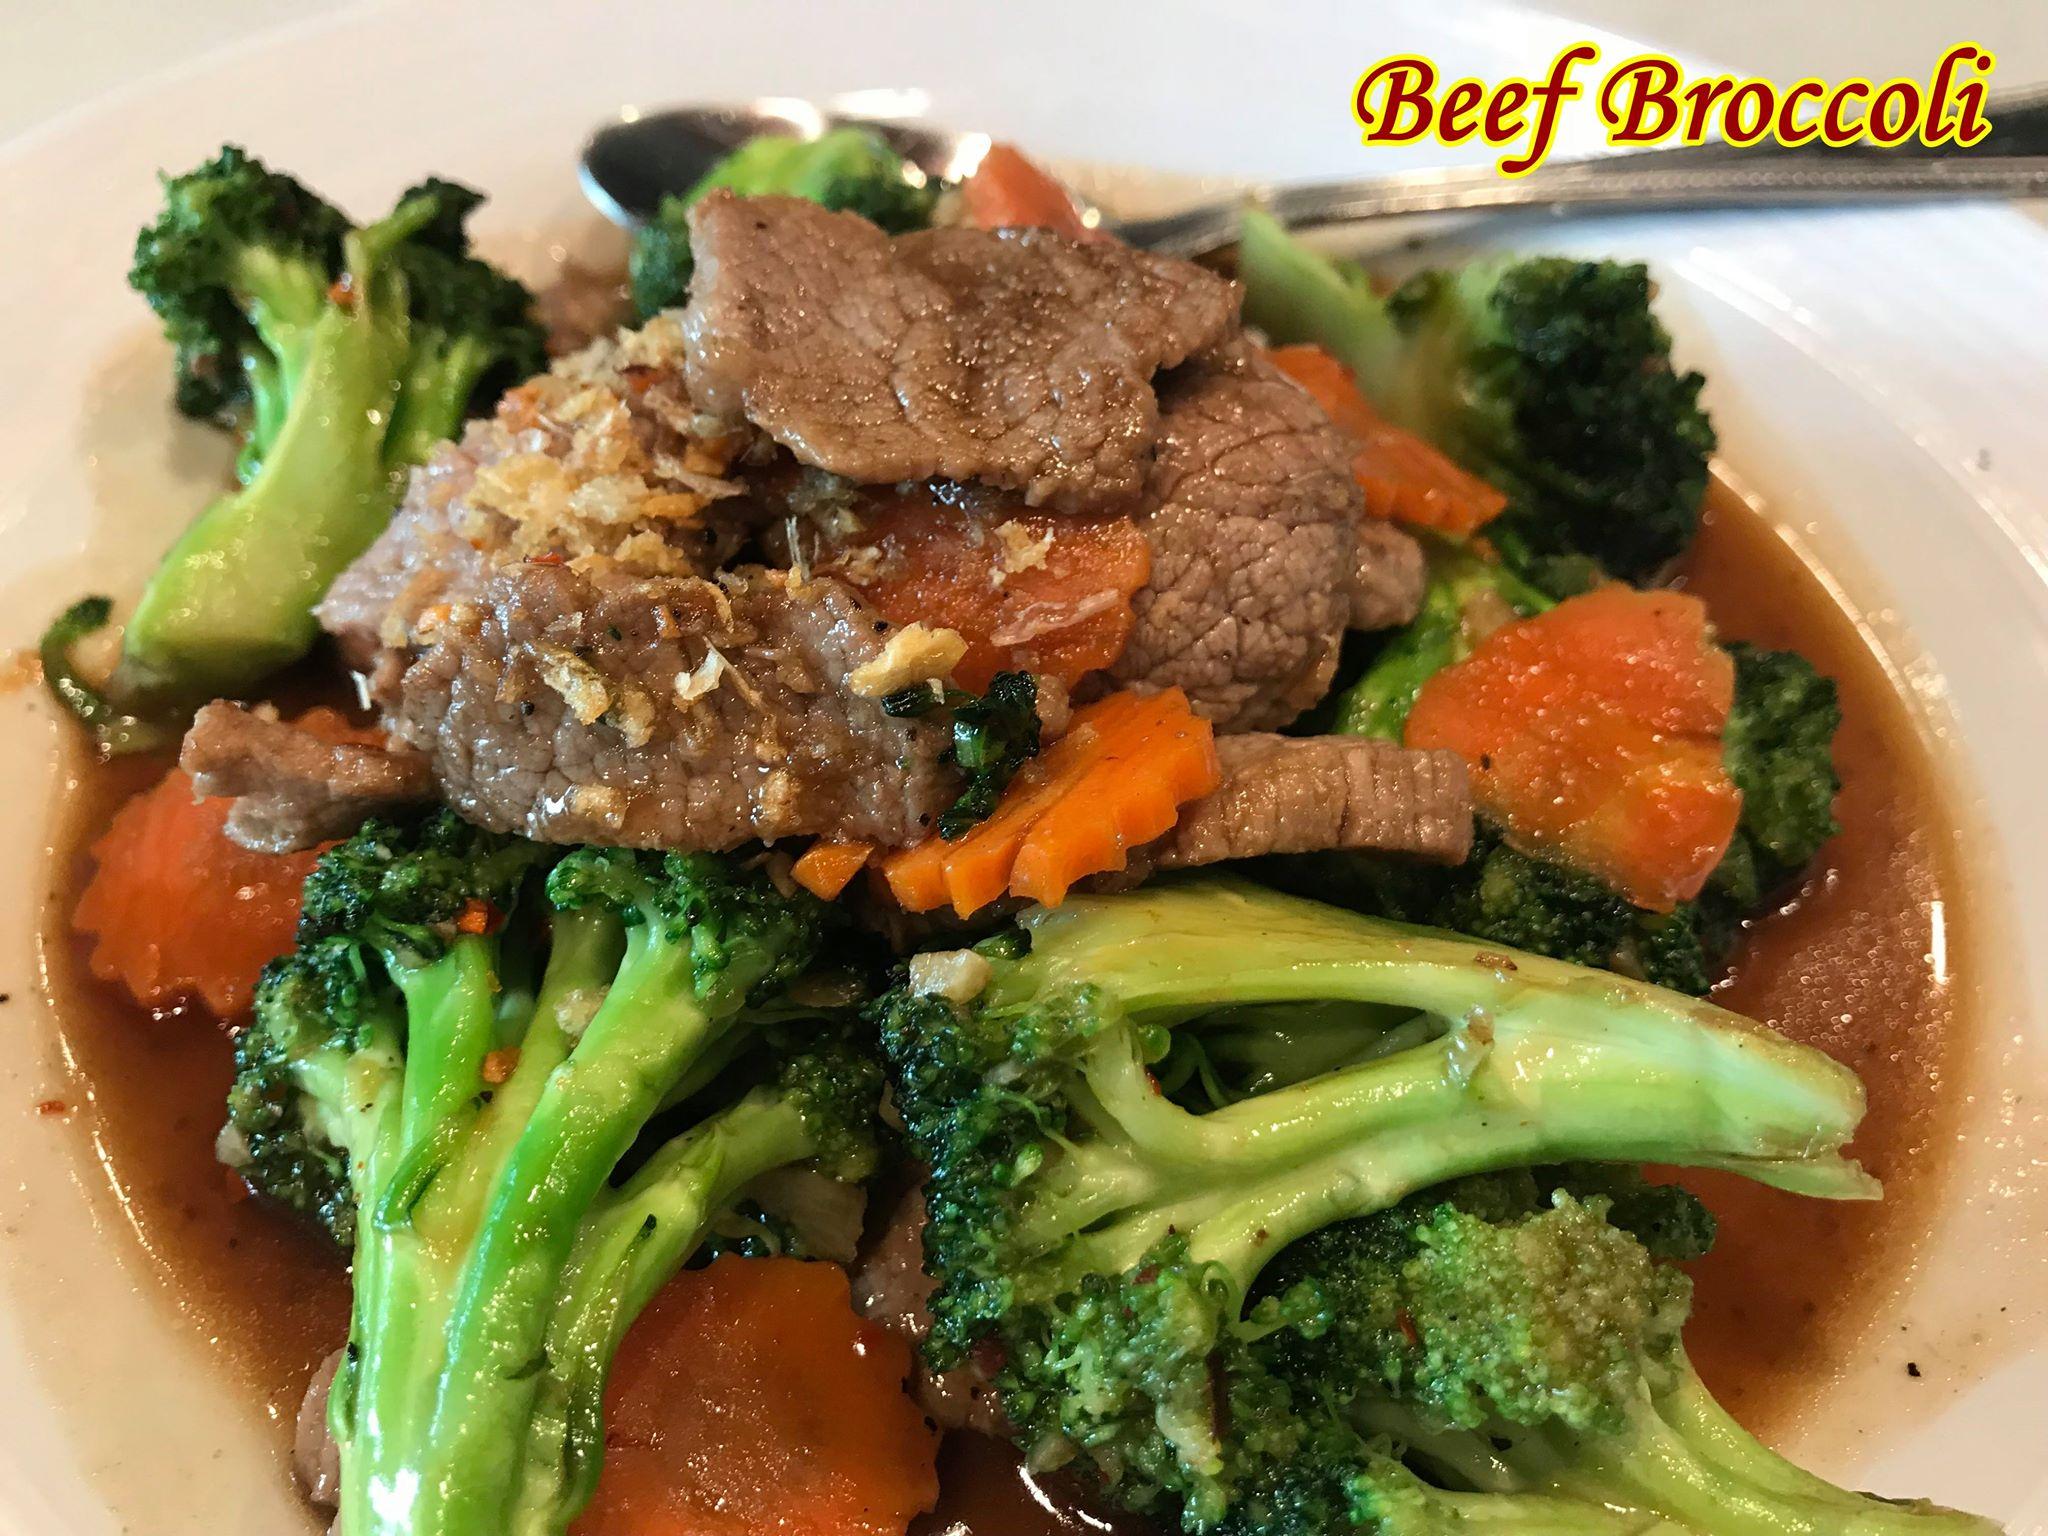 Stir Fried Broccoli Image